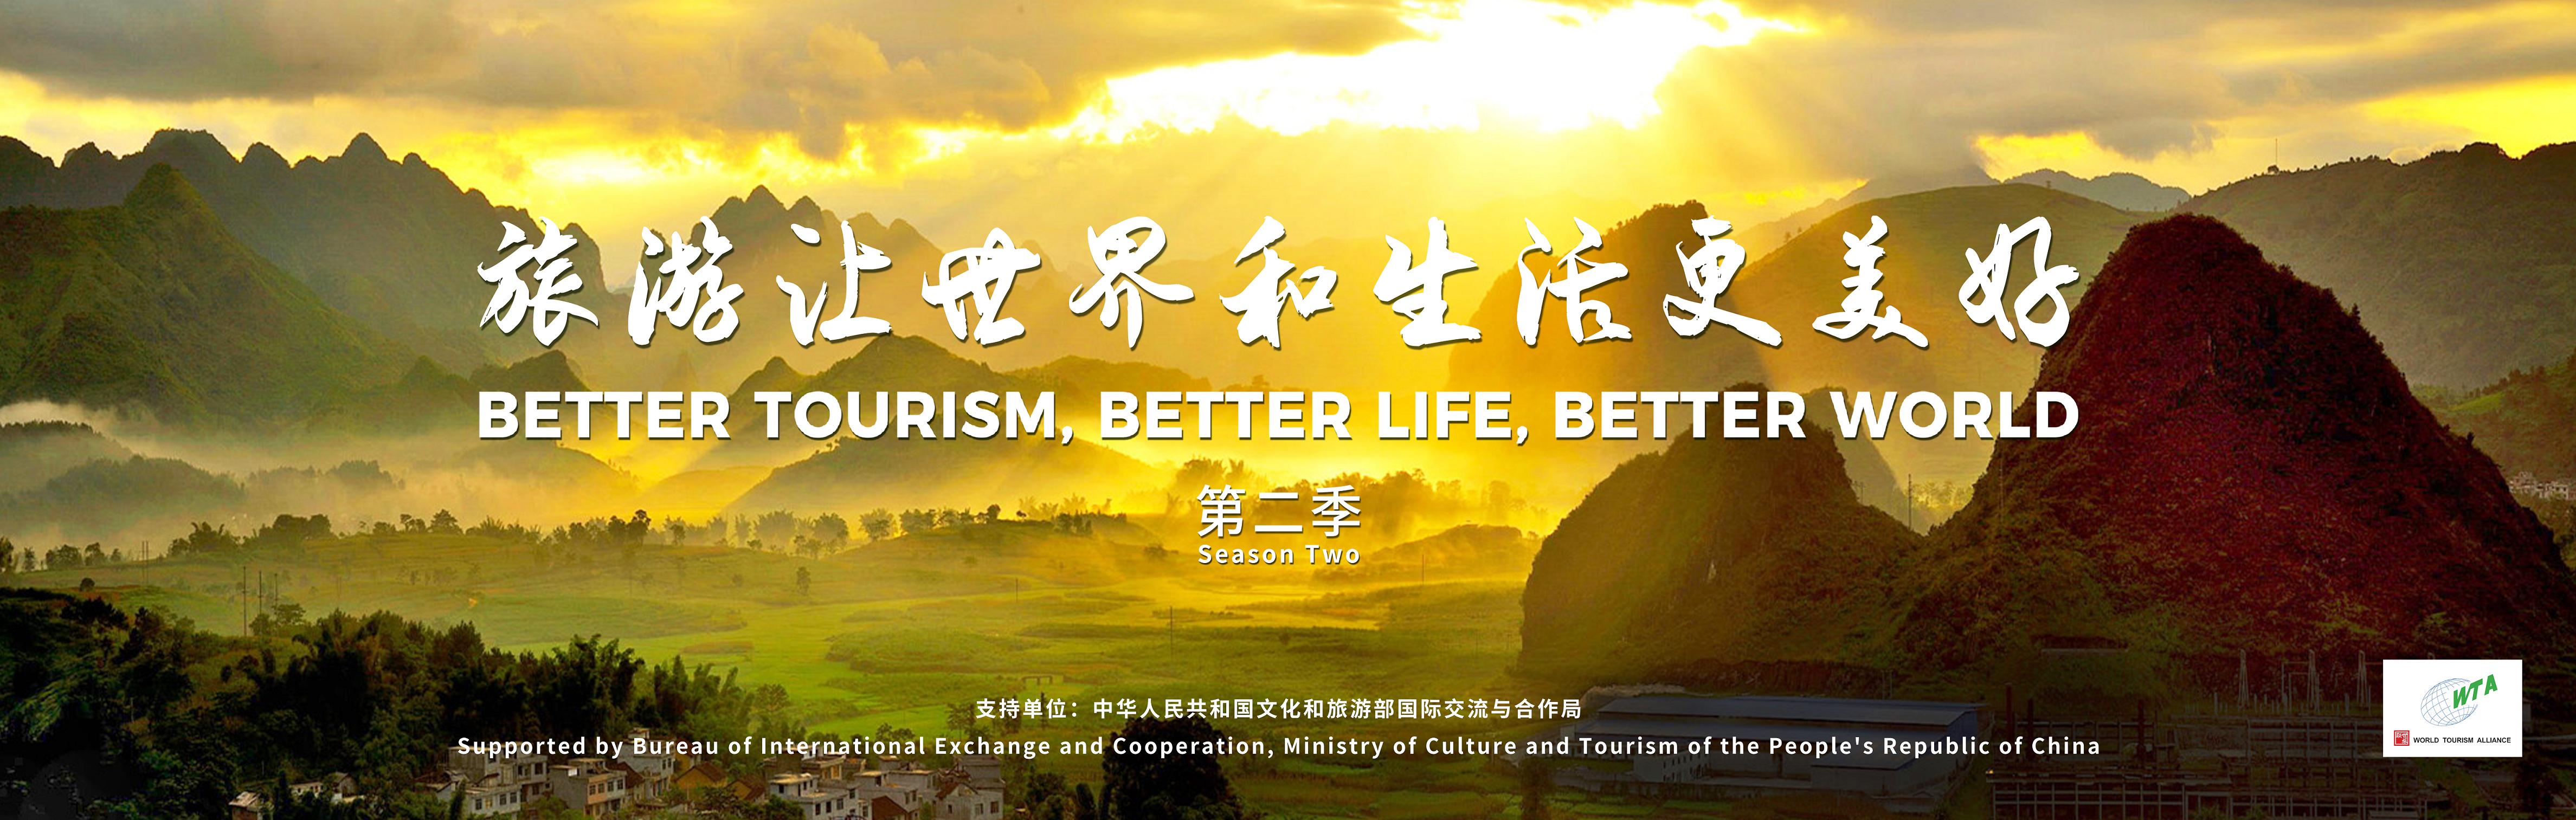 微记录《旅游让世界和生活更美好》第二季 | Better Tourism, Better Life, Better World S2